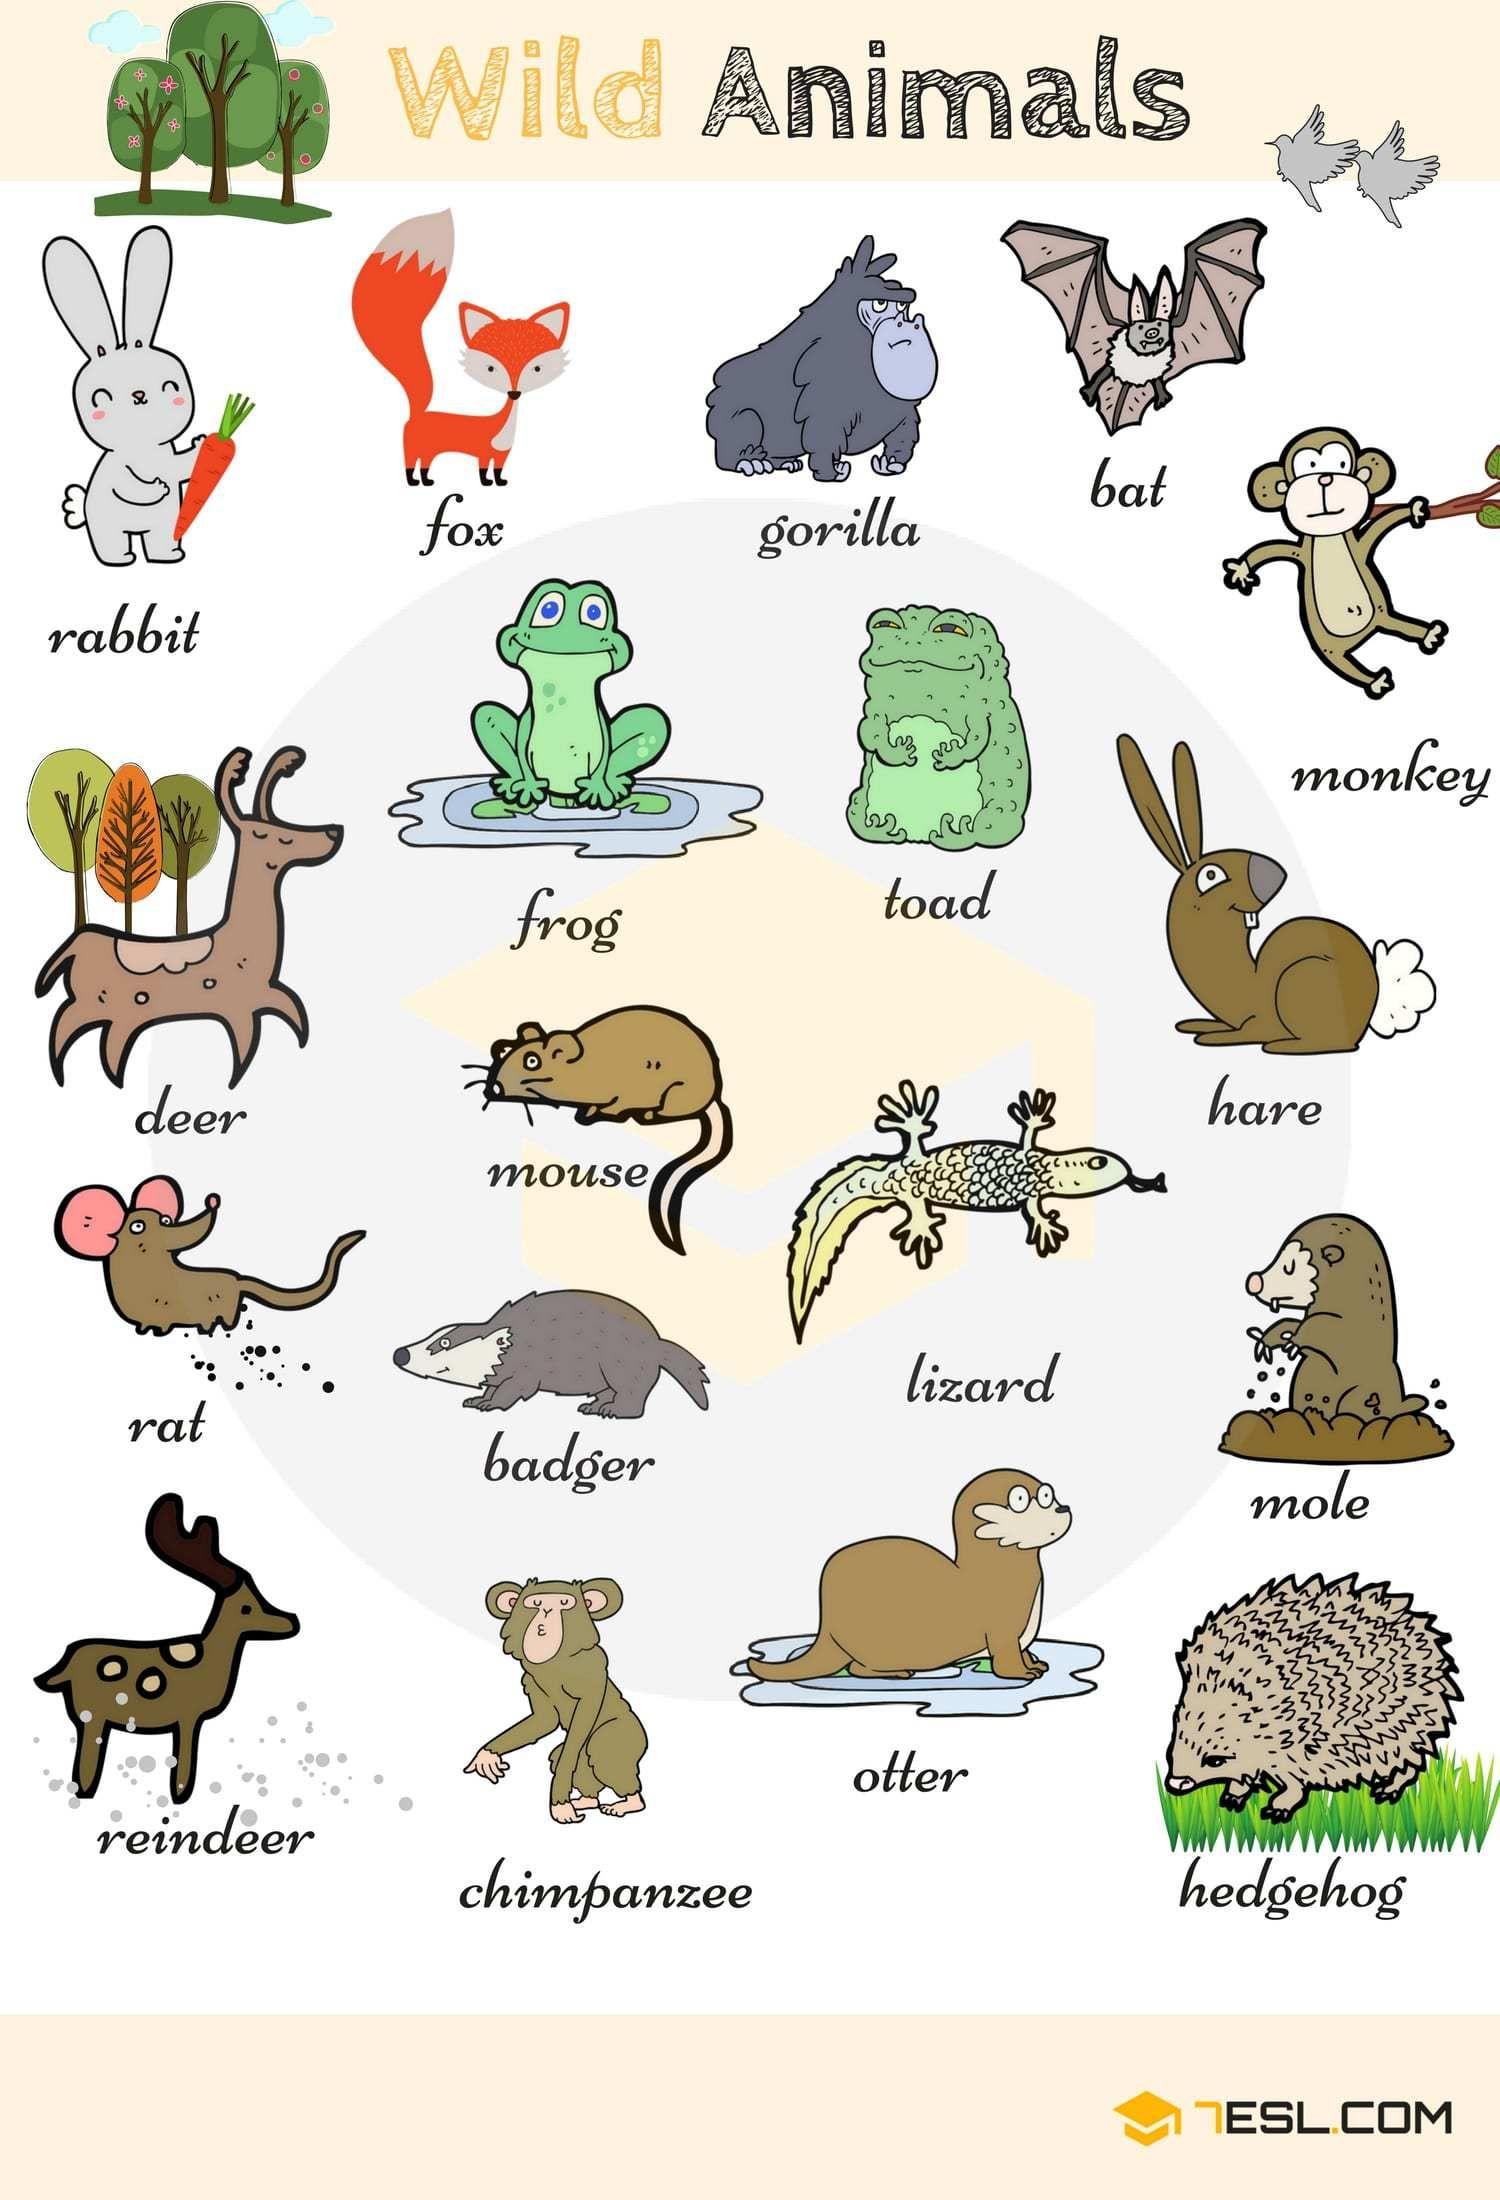 Wild Animal Vocabulary in English Animales en ingles